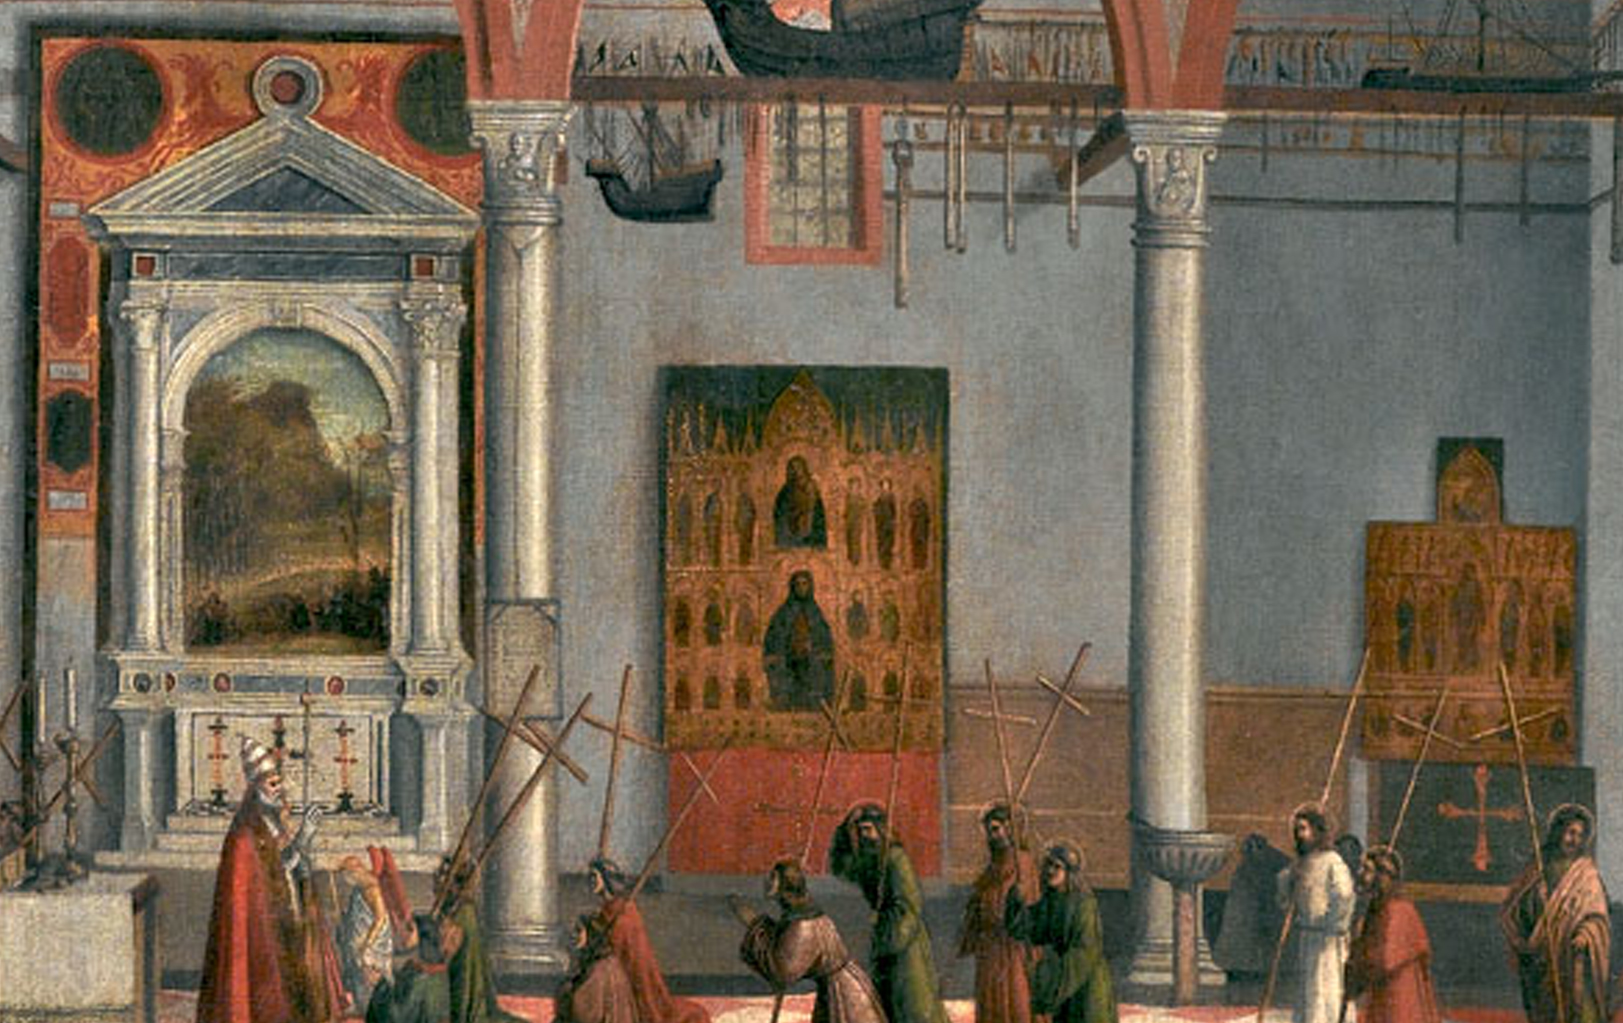 10 Carpaccio Vision of Prior Ottobon San Antonio di Castello 1515 detail 2